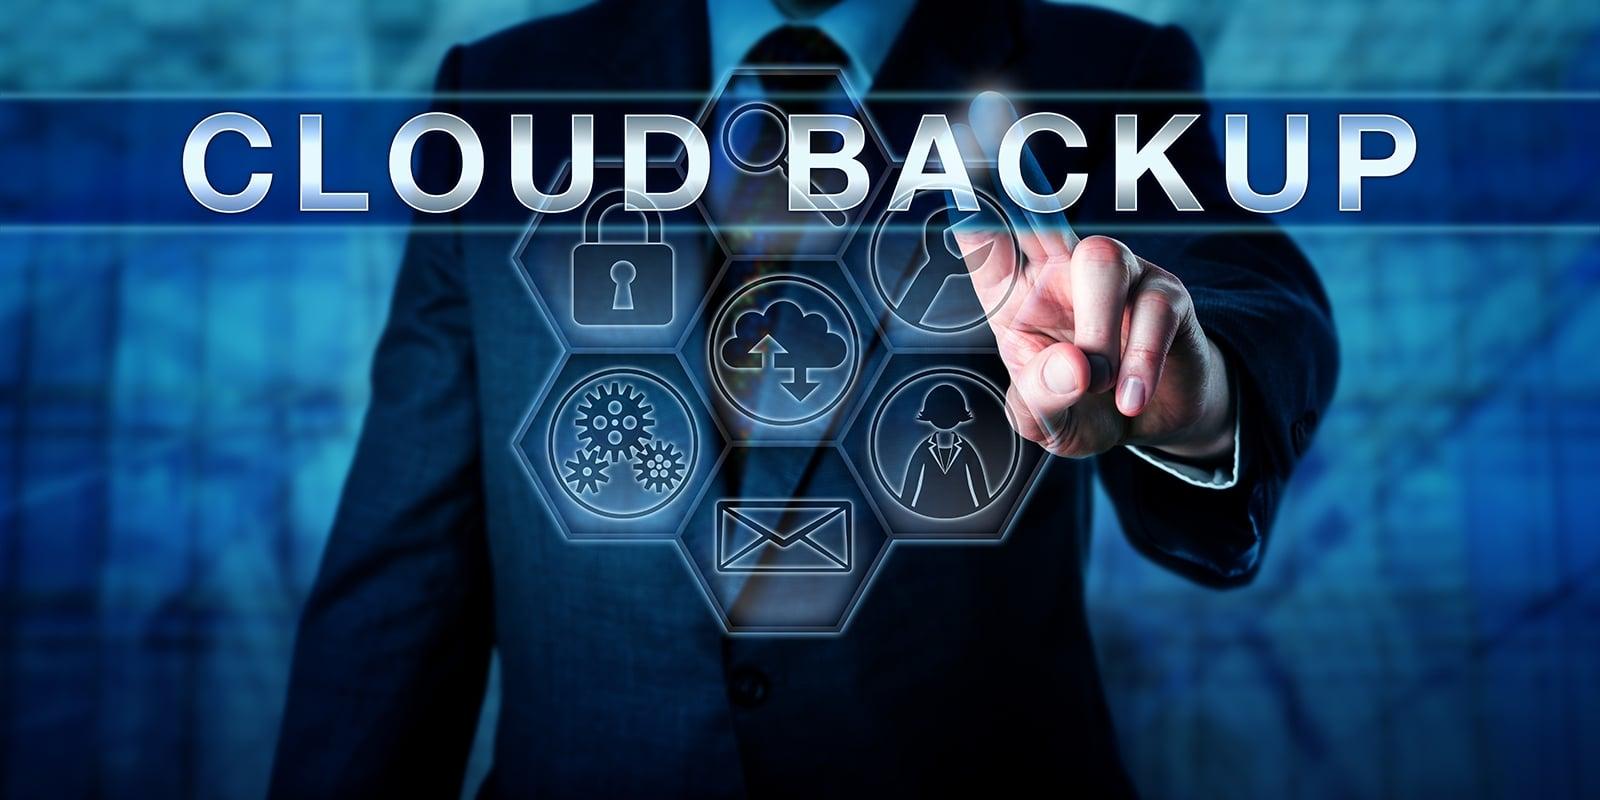 smeup backup aziendale cloud